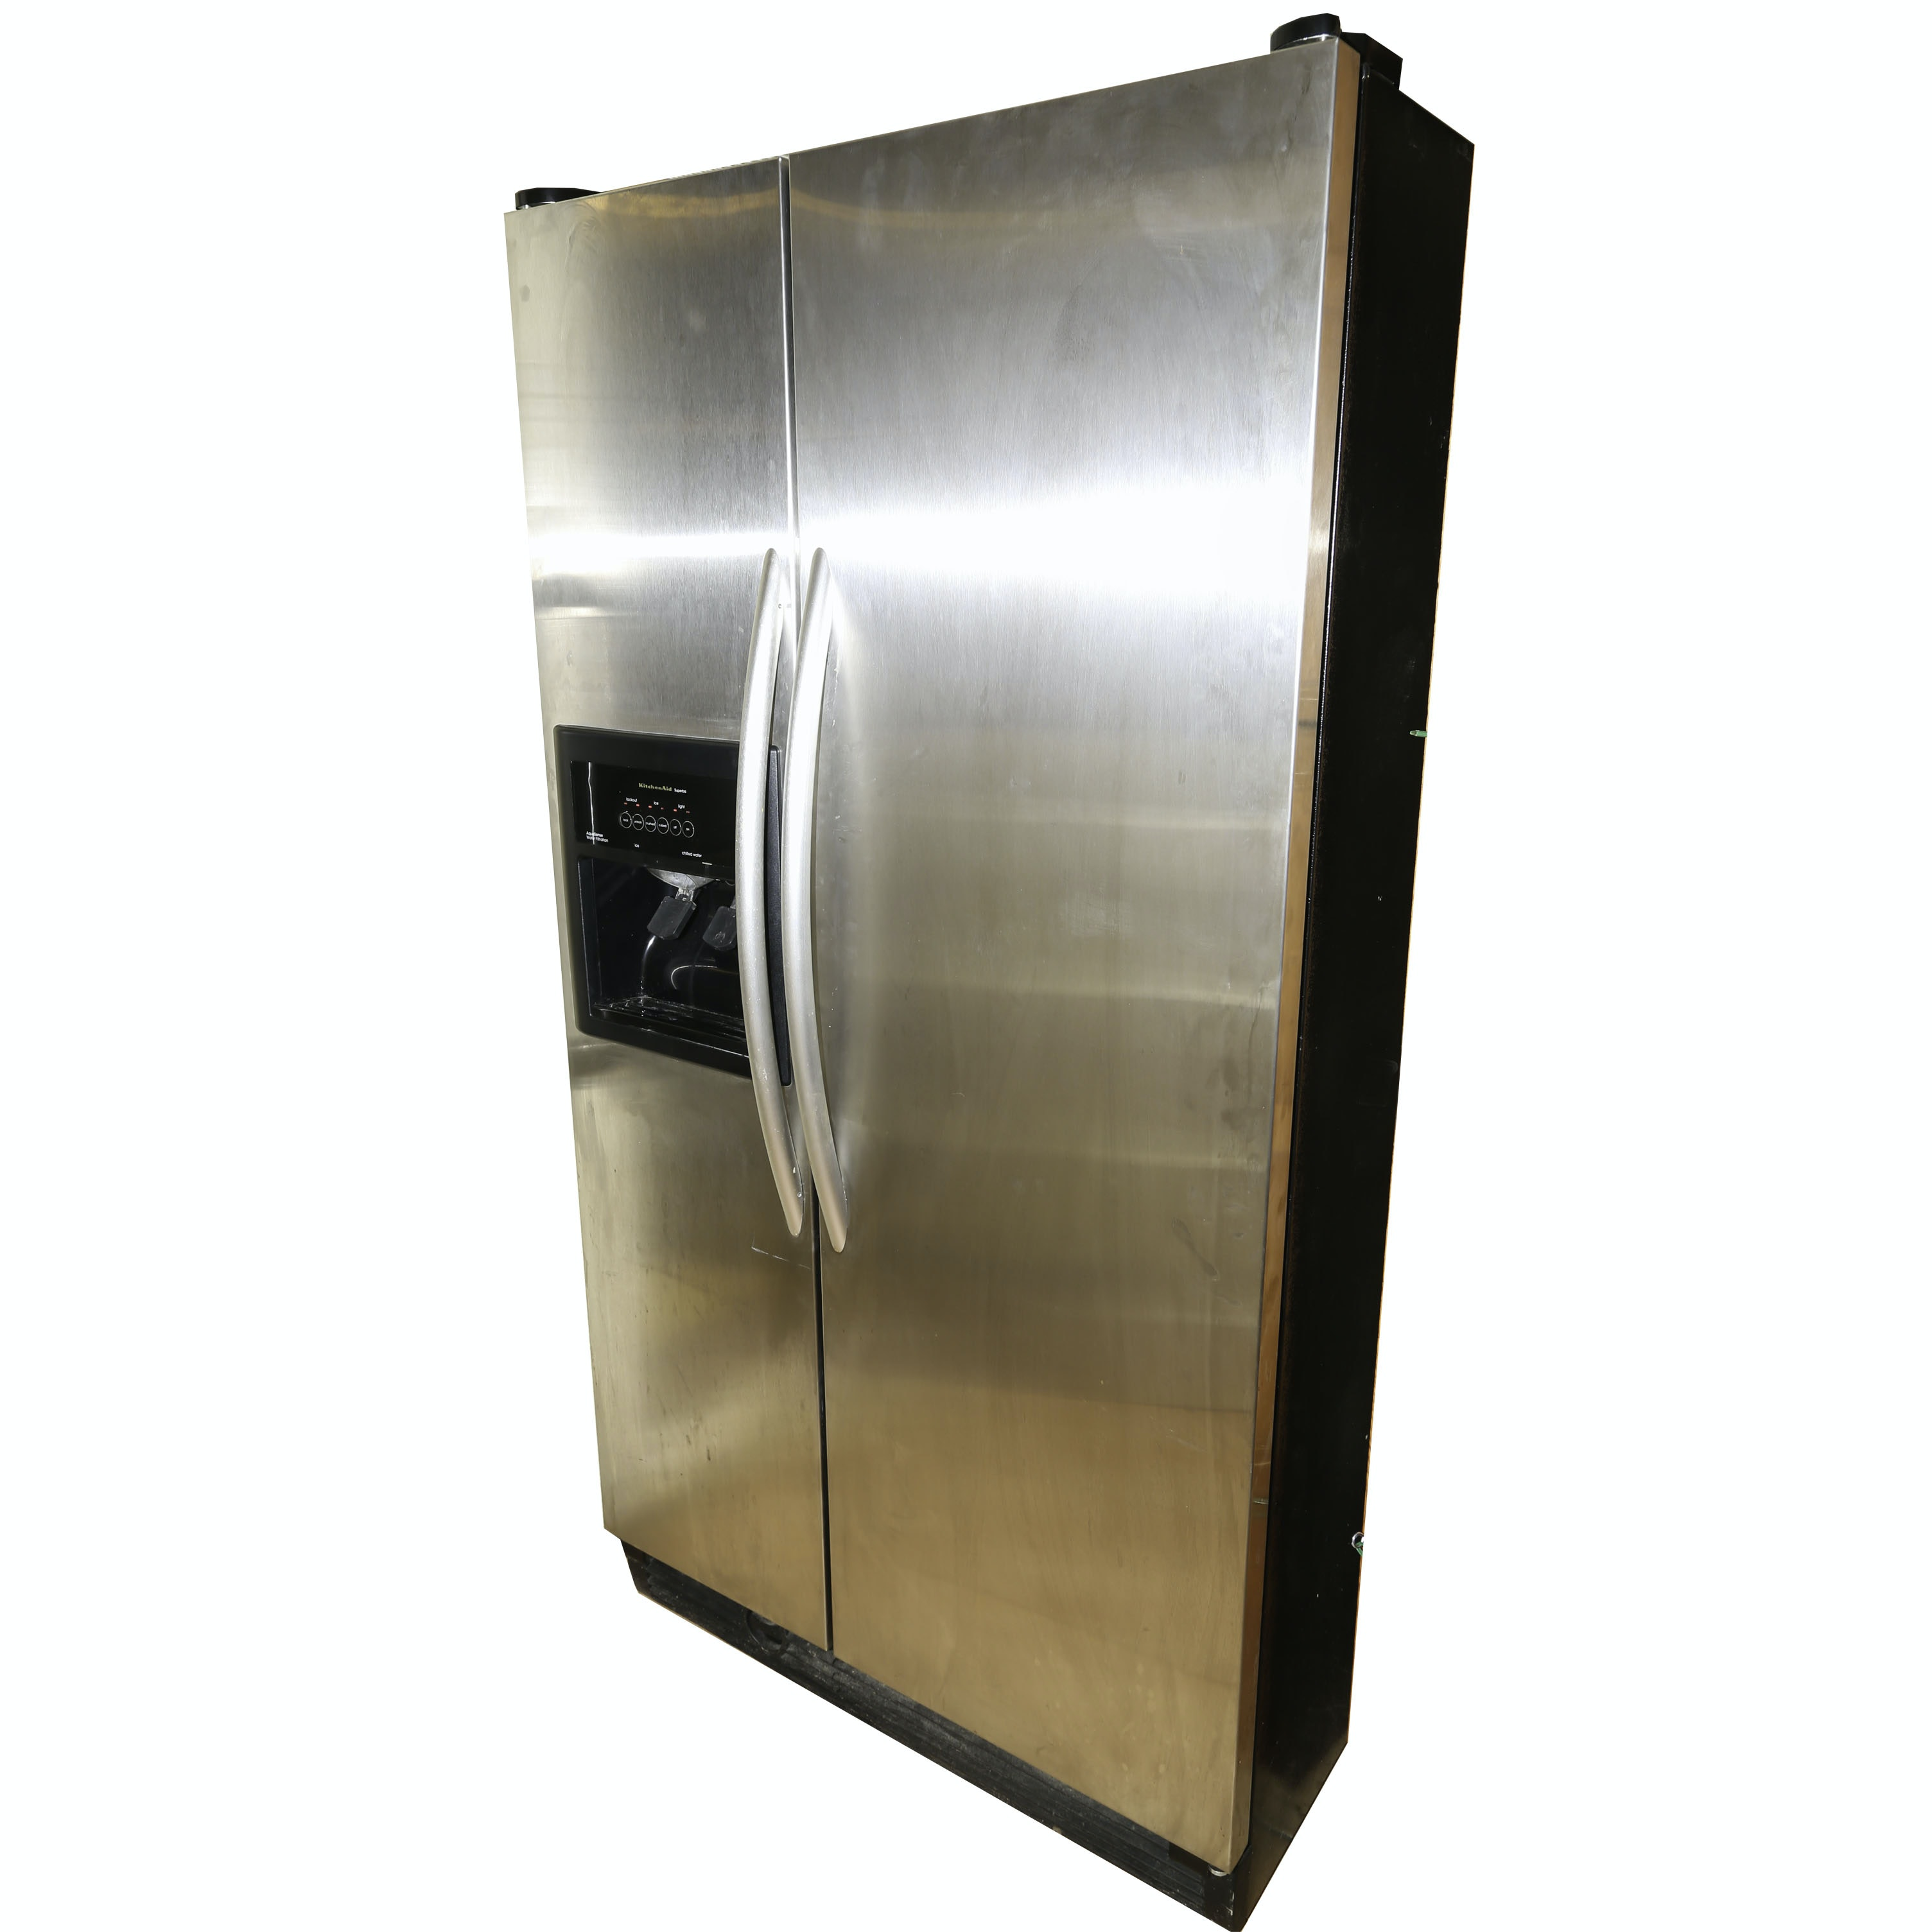 KitchenAid Superba Double Door Stainless Steel Refrigerator